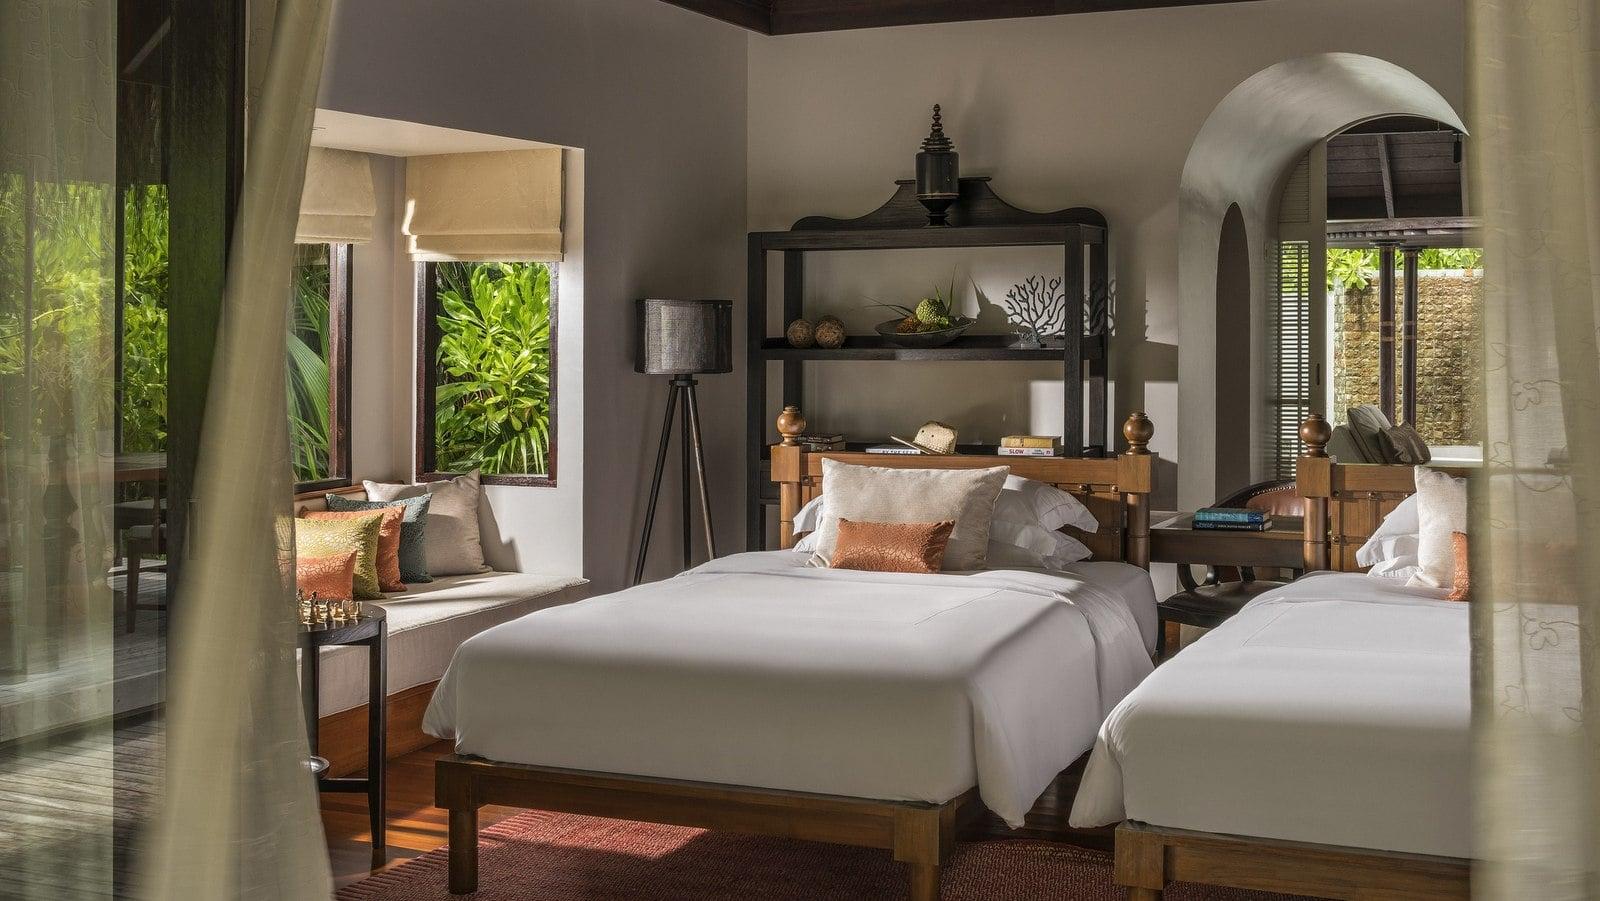 Мальдивы, отель Anantara Kihavah Maldives Villas, номер Three-Bedroom Presidential Beach Residence